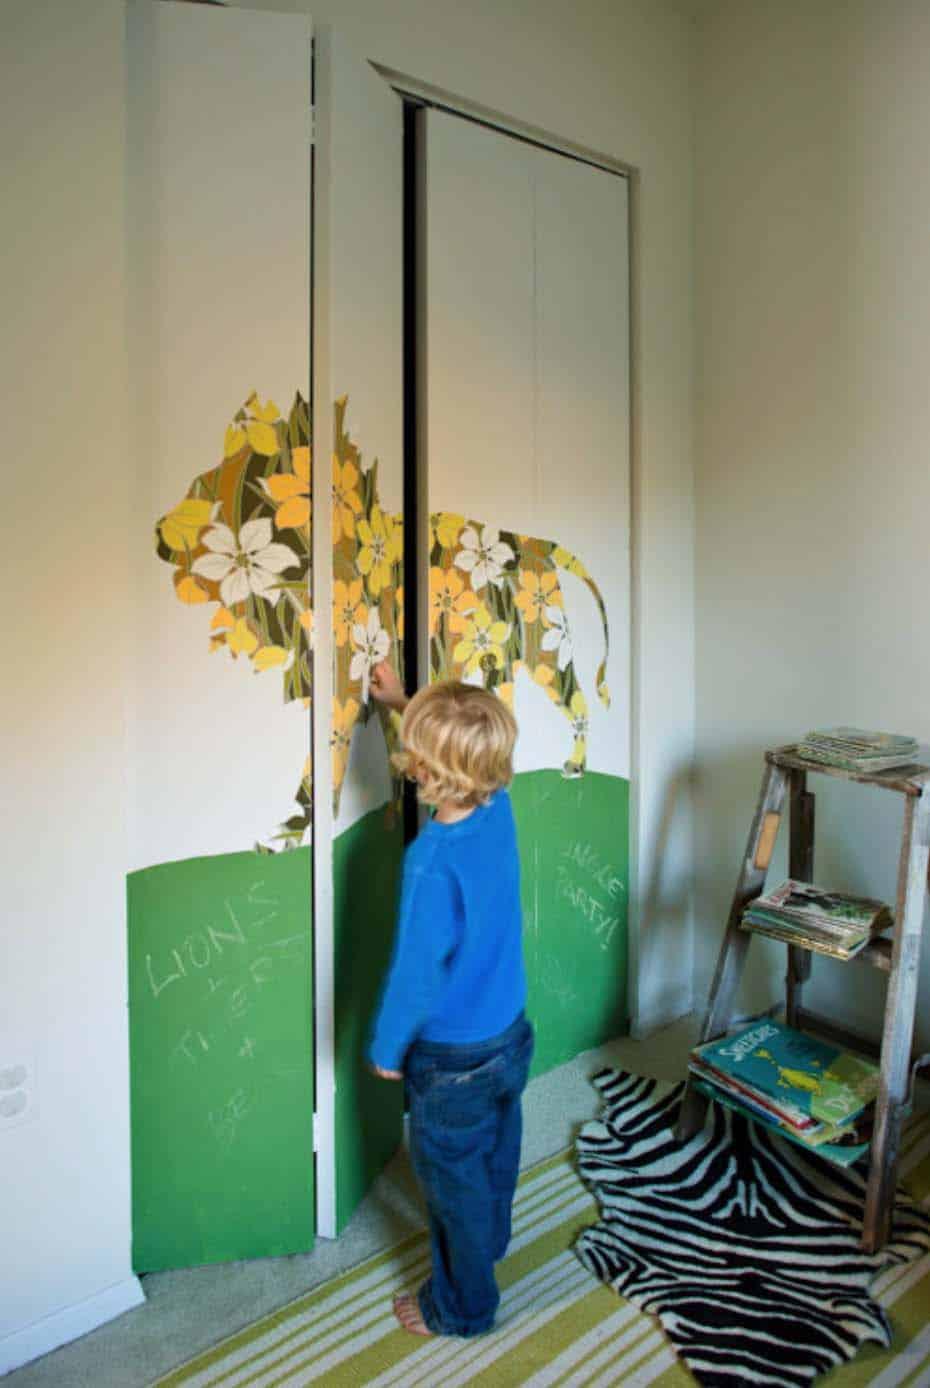 bi-level-home-renovation-lauren-liess-interiors-18-1-kindesign